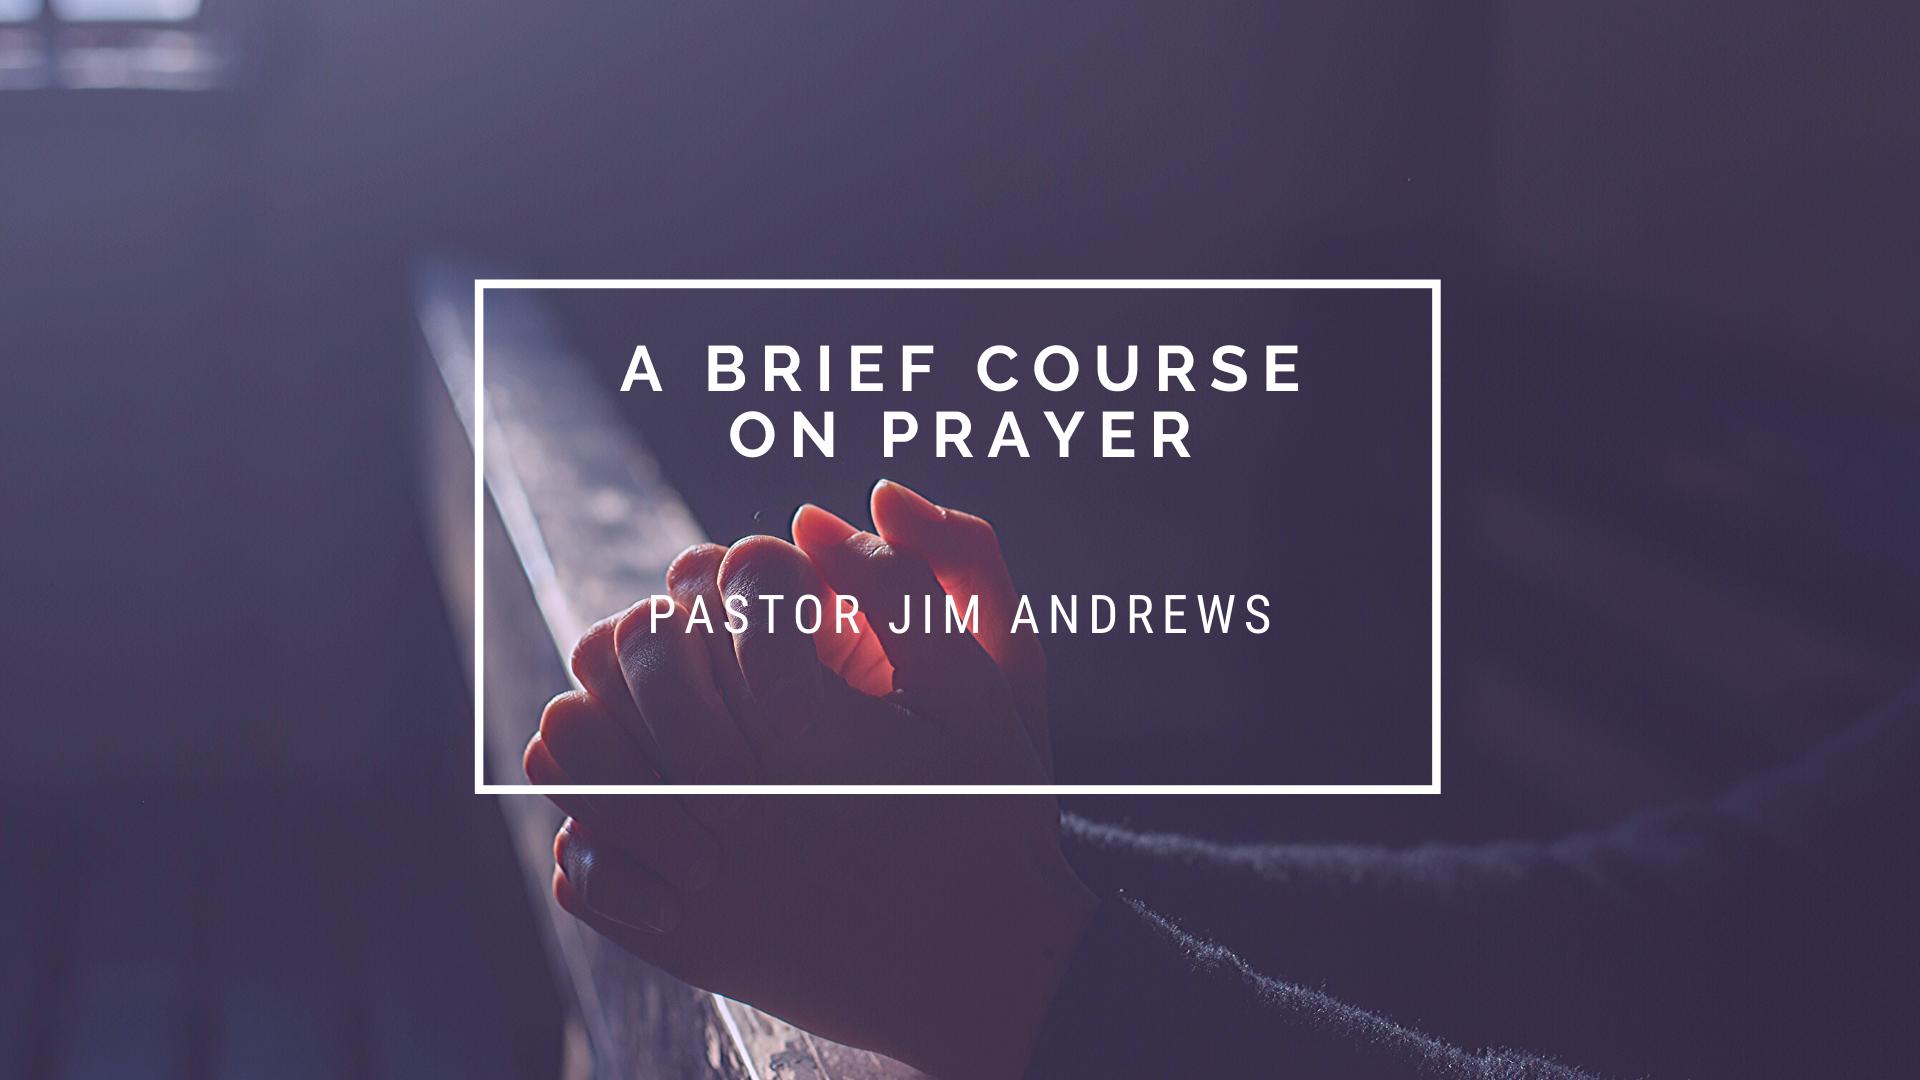 A Brief Course on Prayer